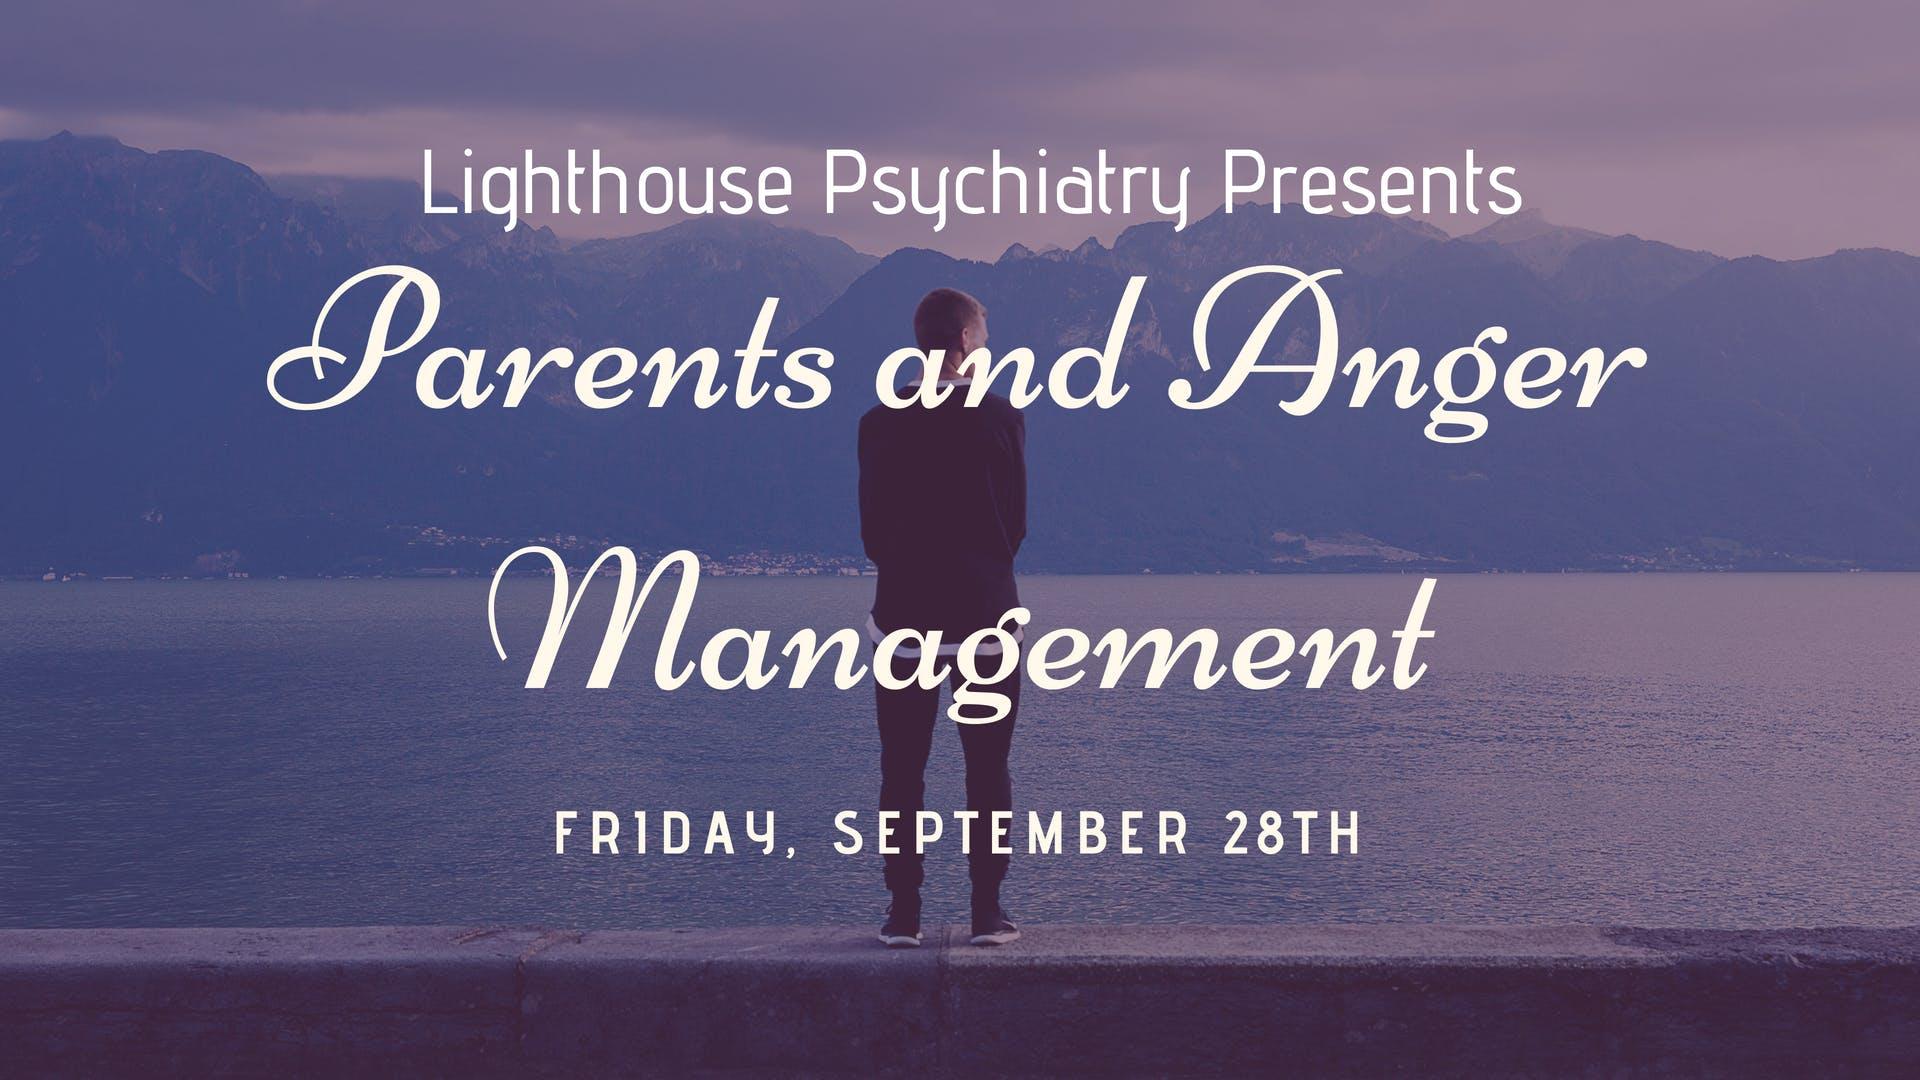 Parents and Anger Management Workshop